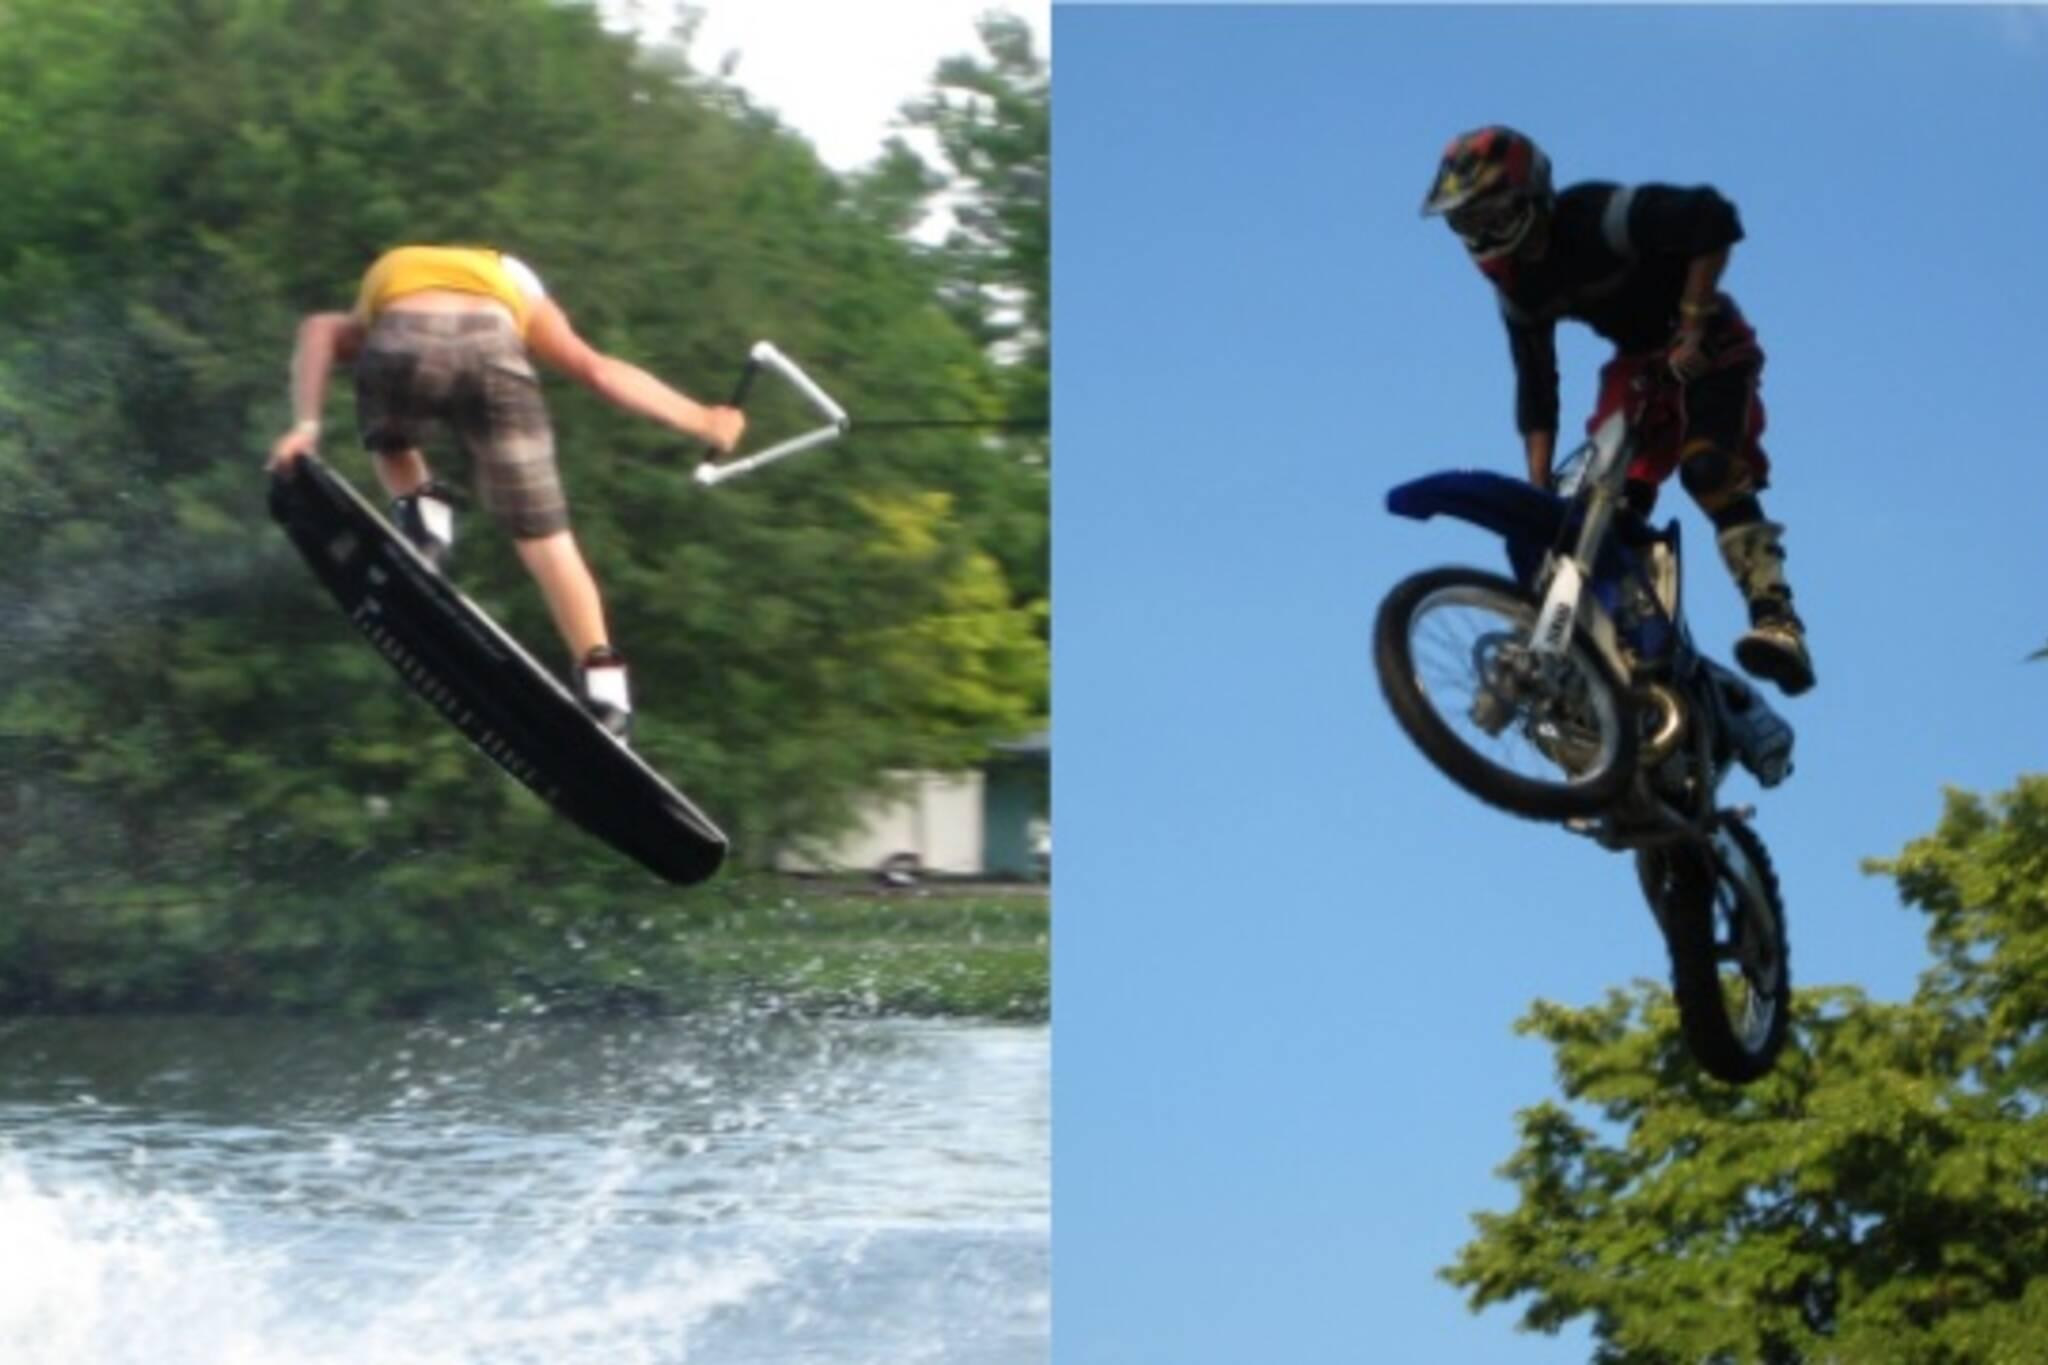 Wakestock Extreme Sport